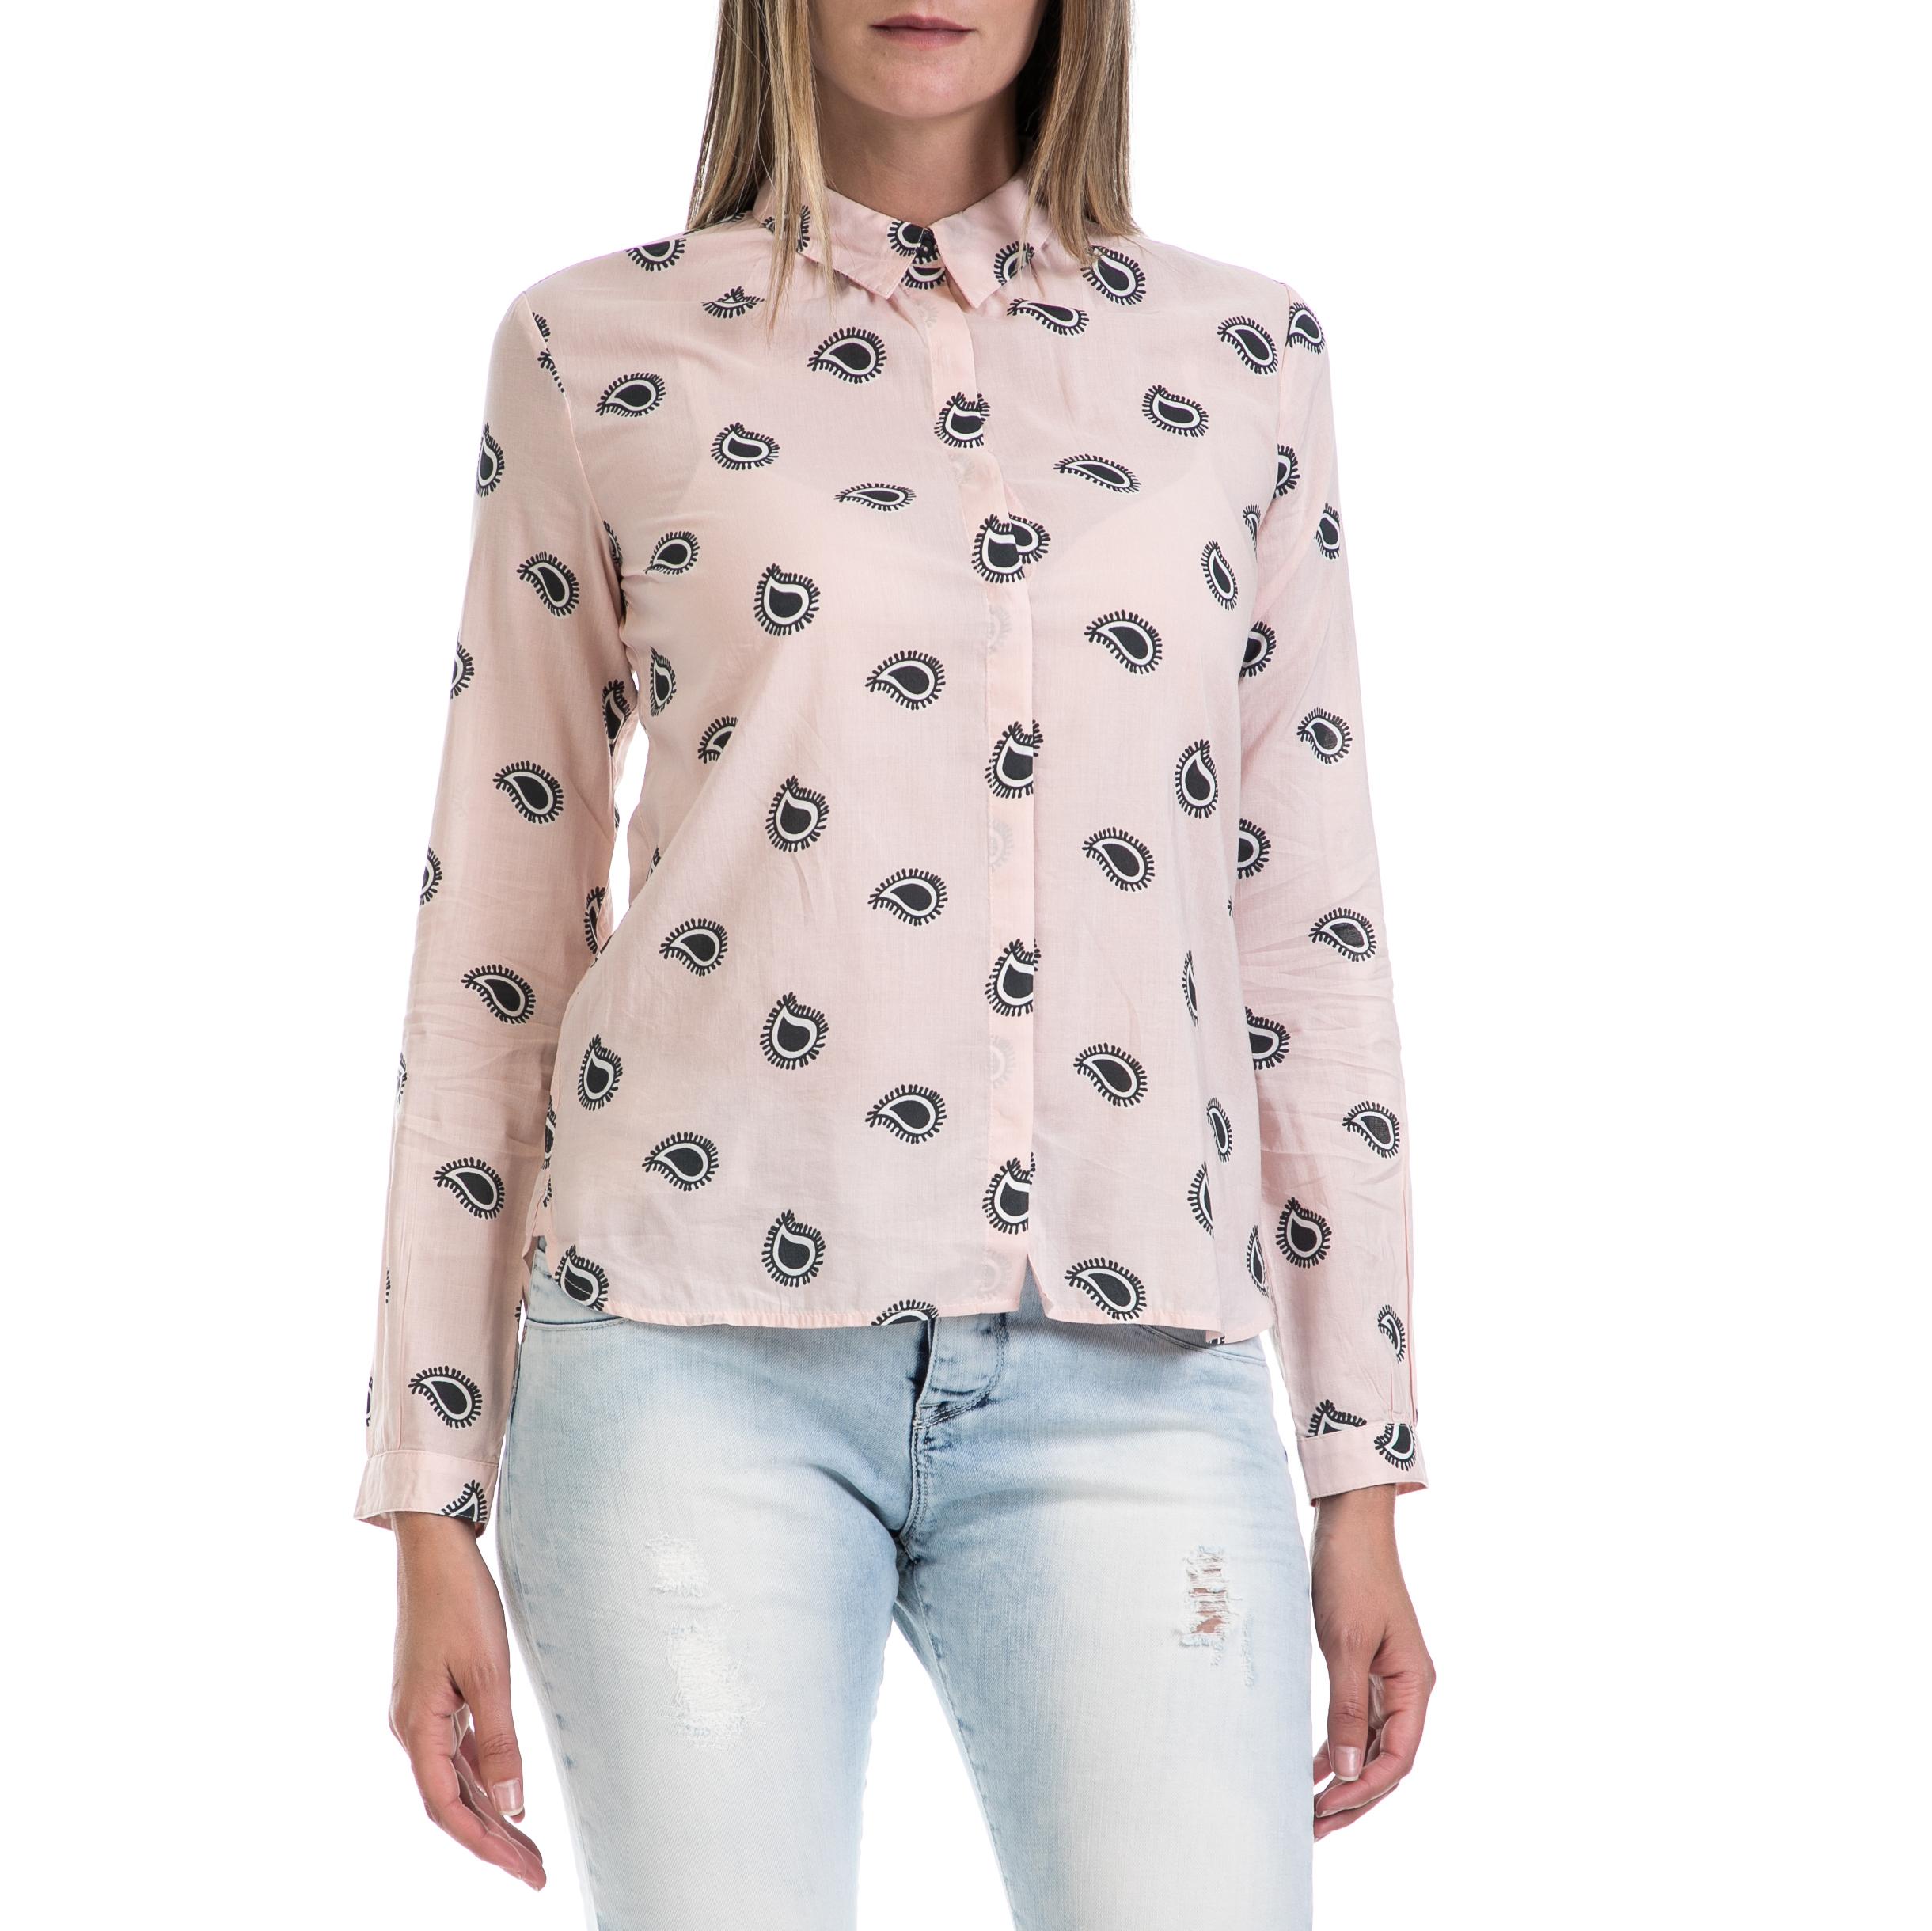 SCOTCH & SODA - Γυναικείο πουκάμισο MAISON SCOTCH ροζ-μαύρο γυναικεία ρούχα πουκάμισα μακρυμάνικα